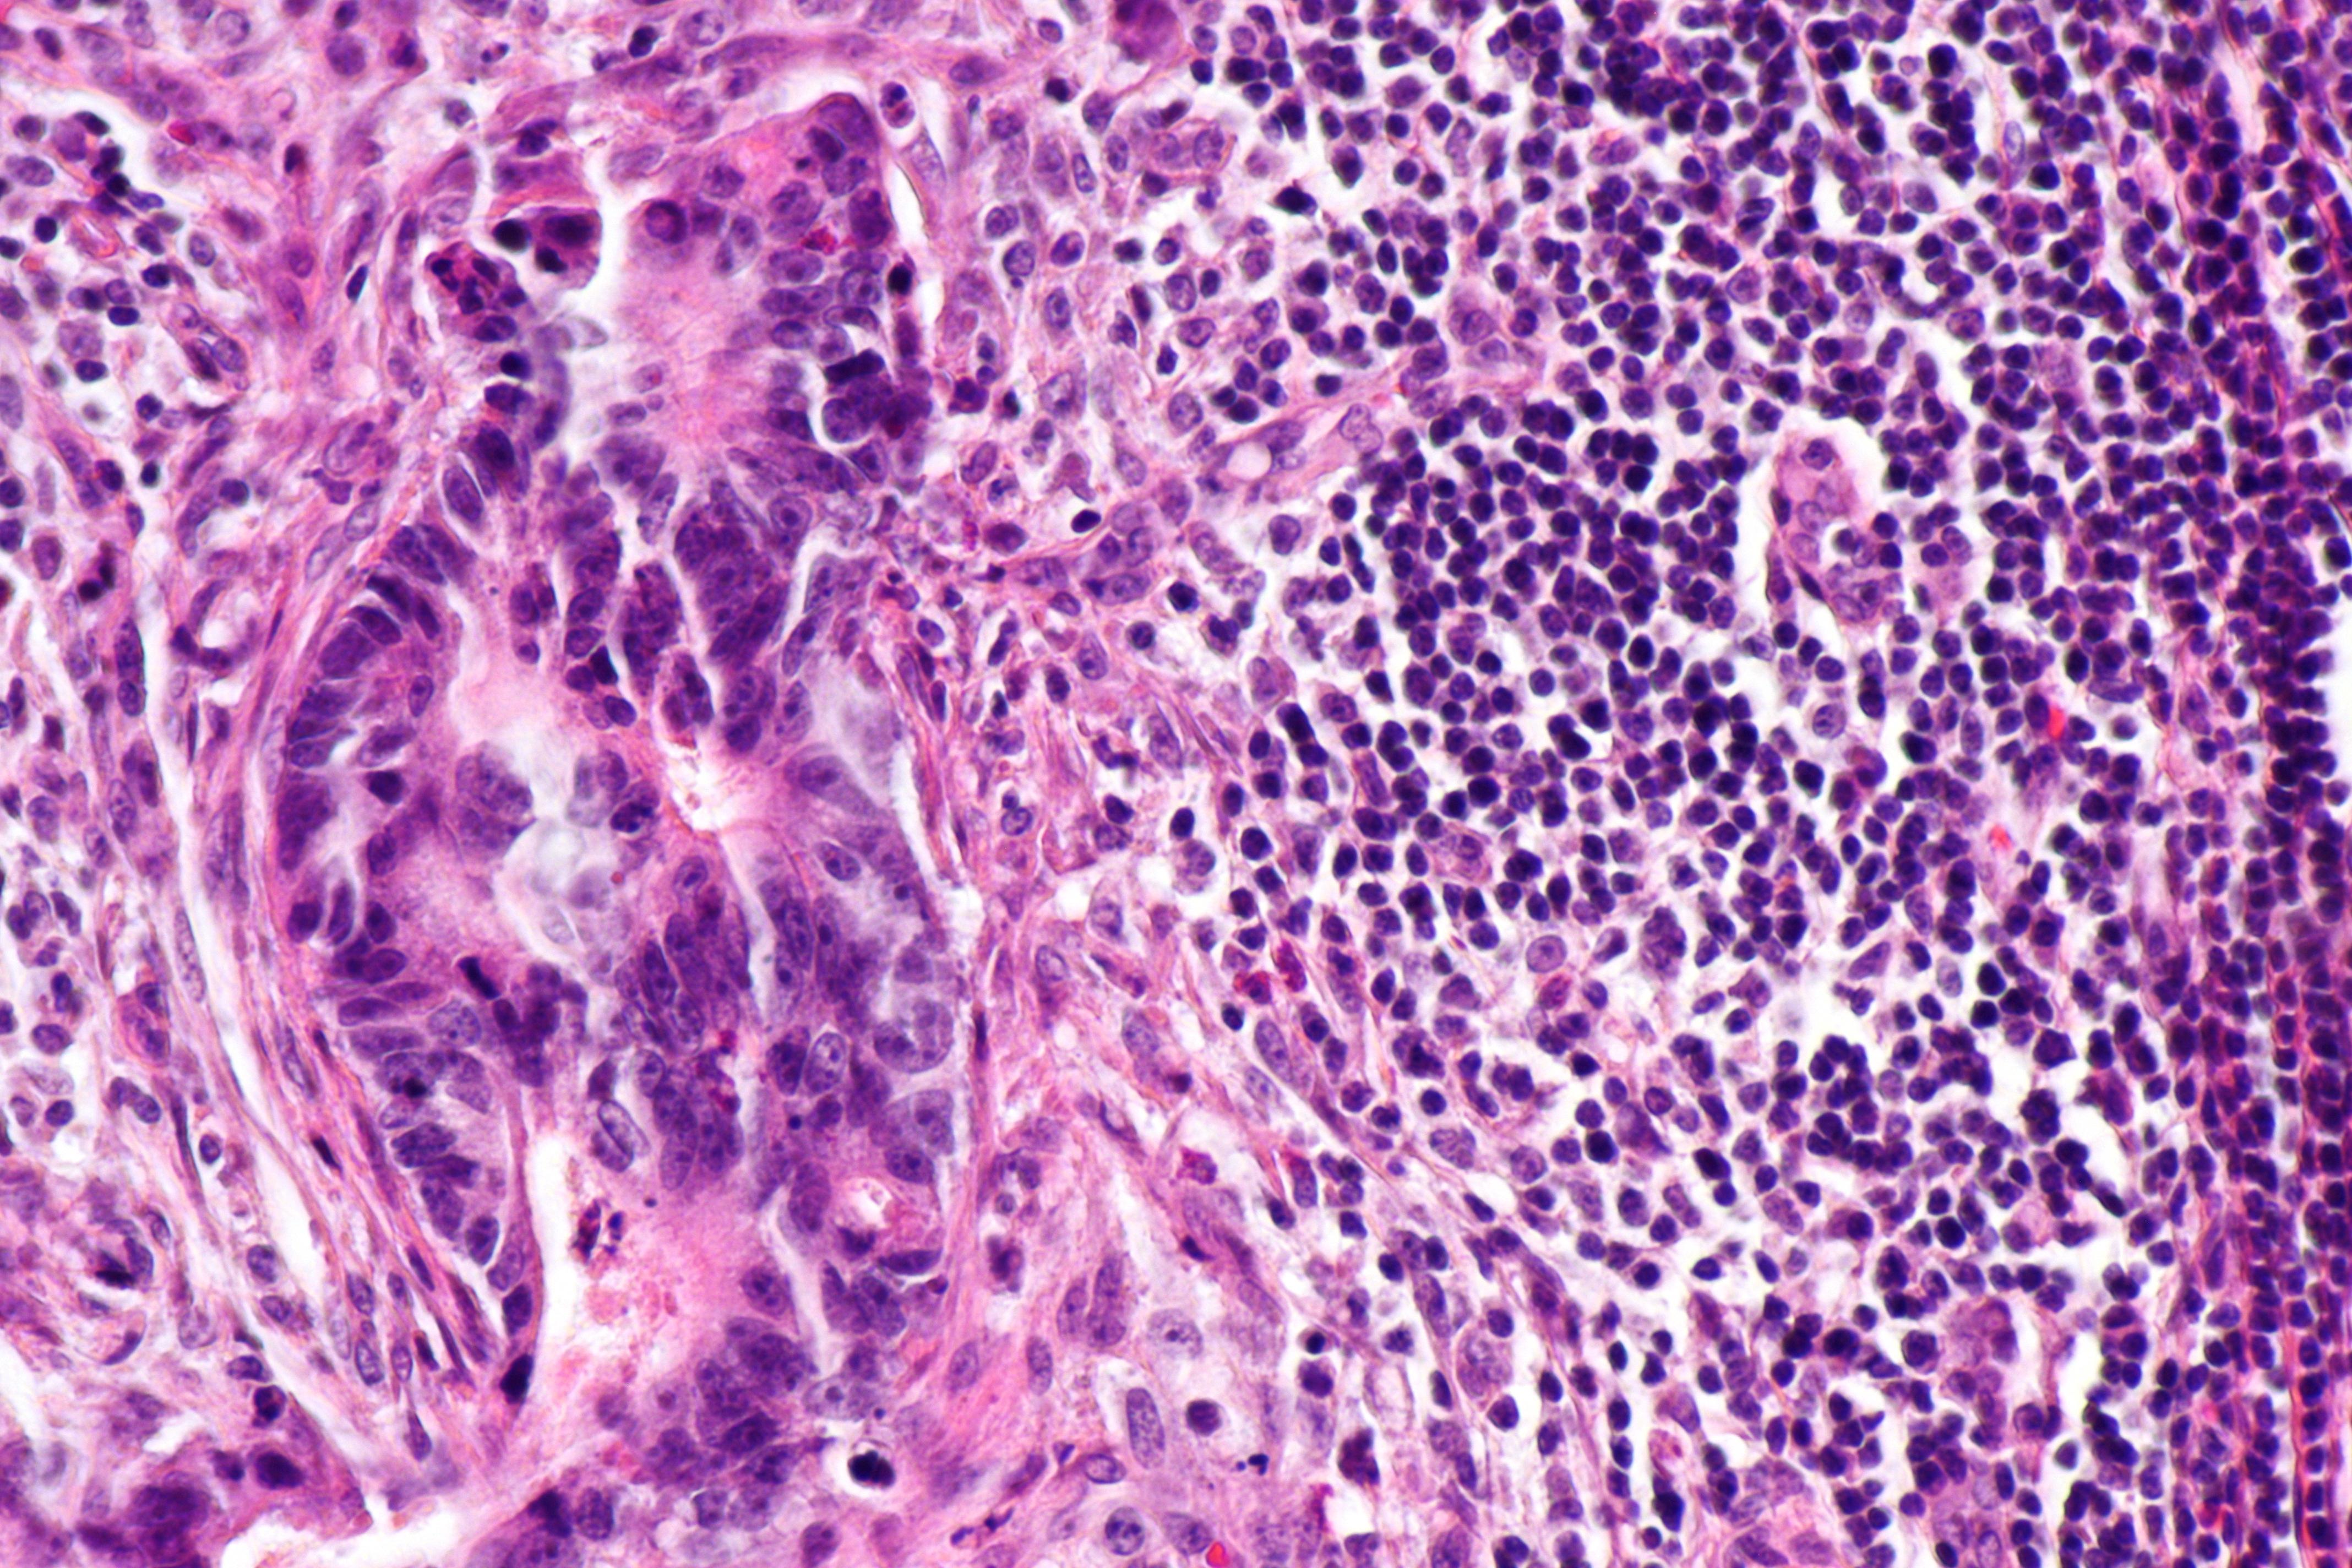 colorectal cancer lymph node metastasis